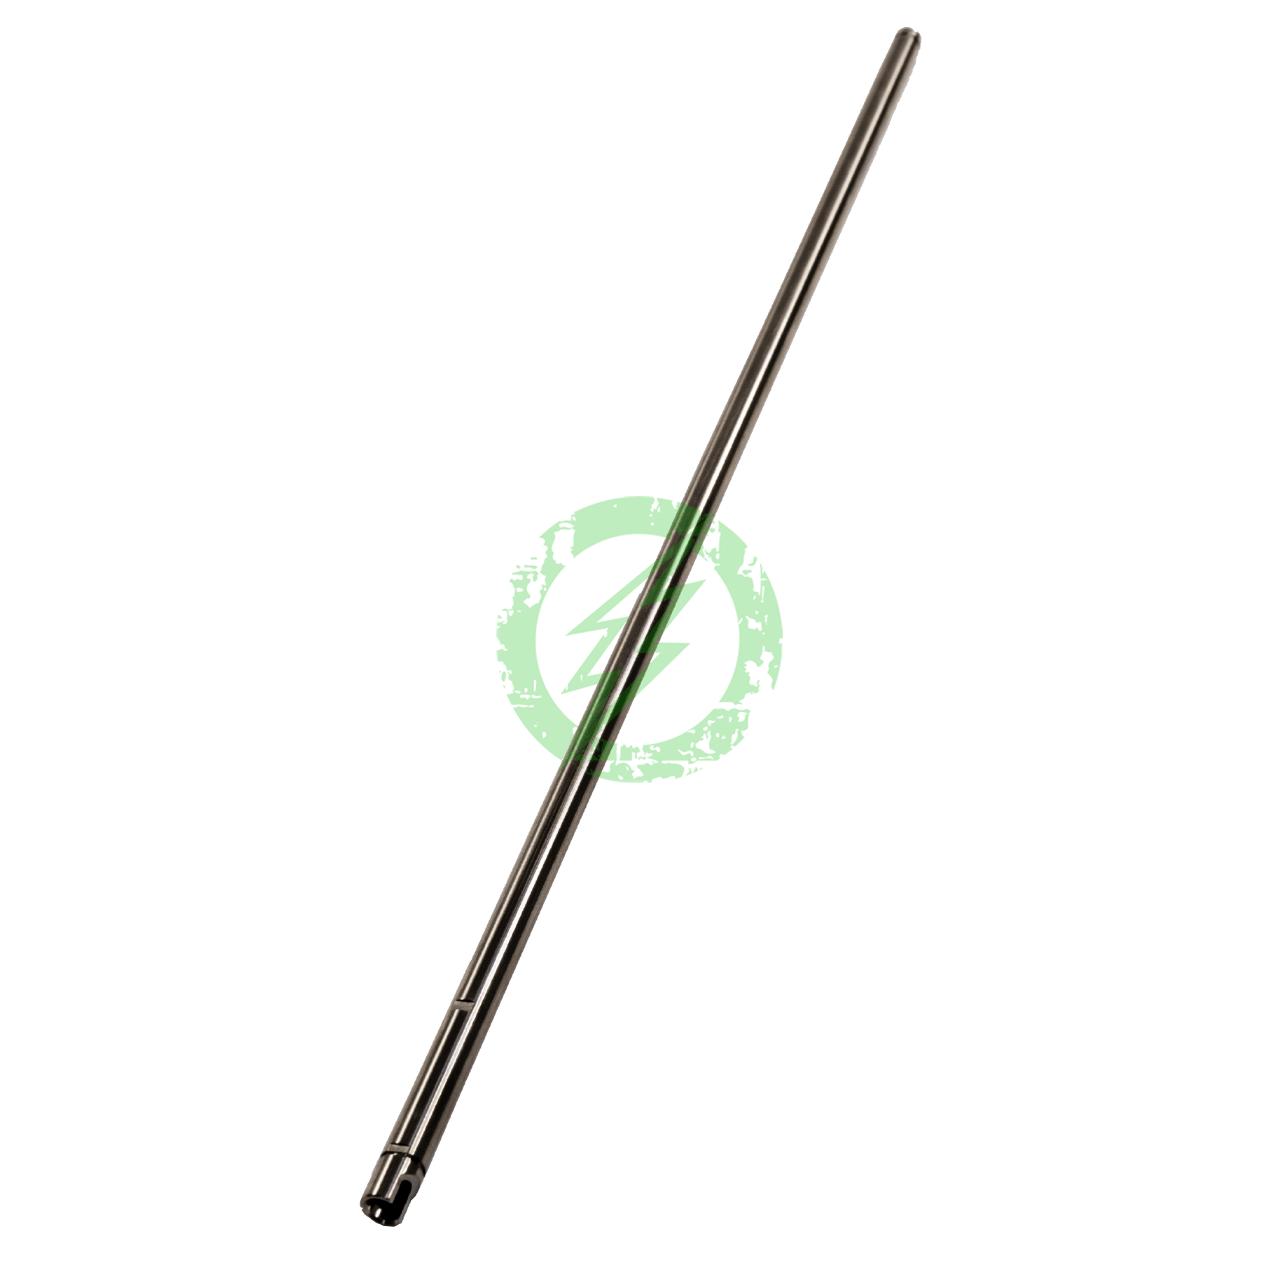 Action Army 6.01mm Precision Tight Bore VSR Inner Barrel | 430mm - 500mm